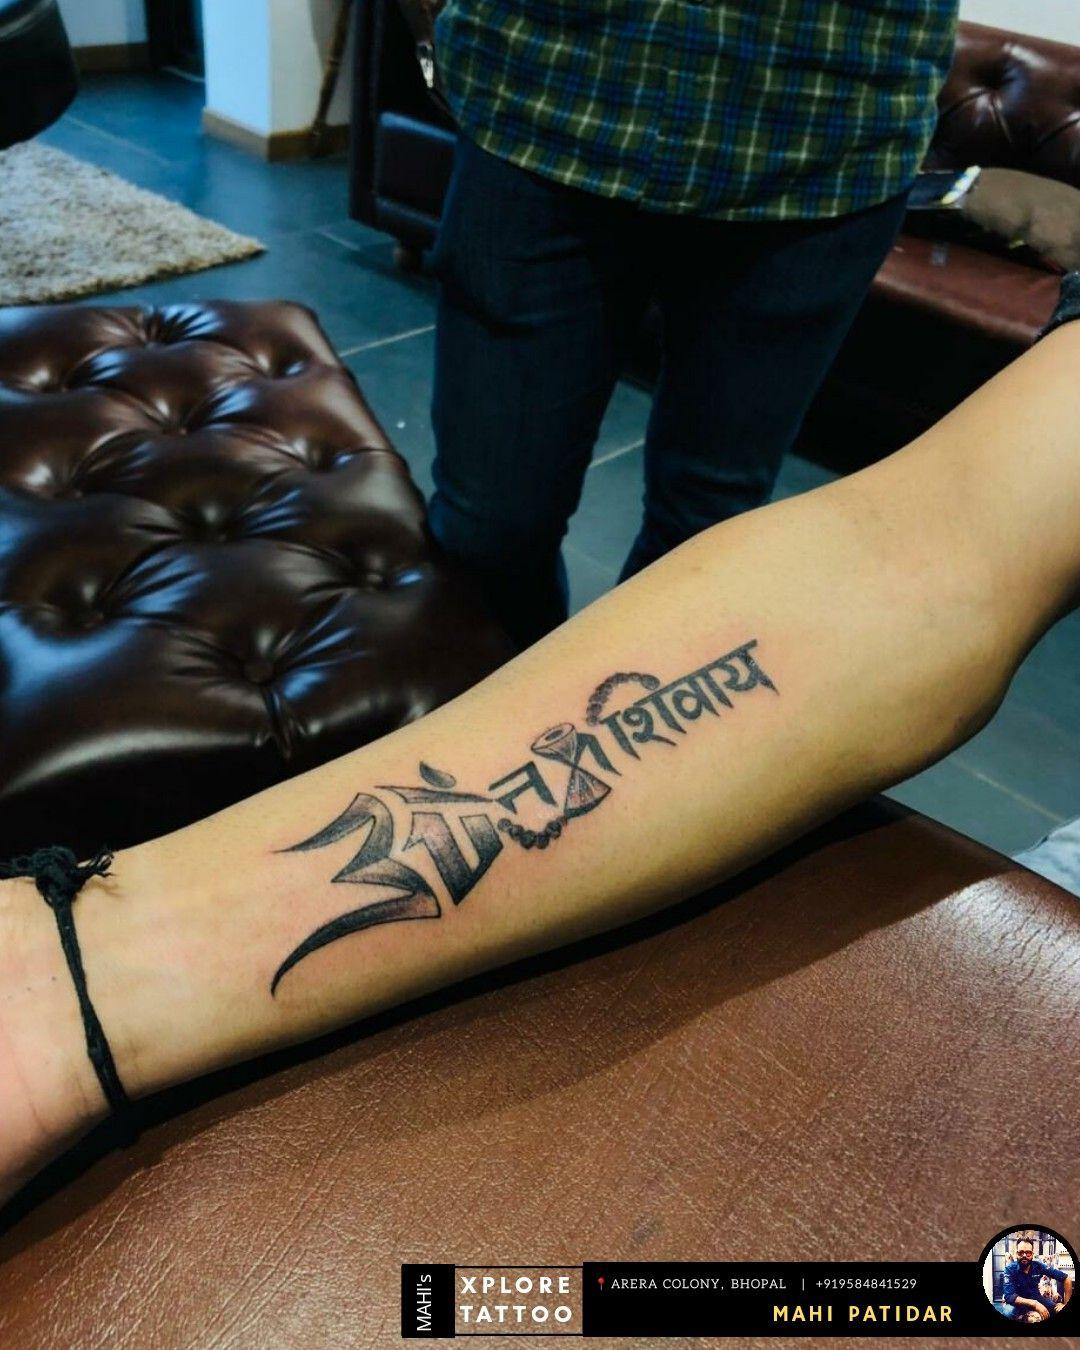 Lord Shiva Om Namah Shivay Mahakal Full Sleev Hand Tattoo Design By Mahi Patidar Bhopal In 2020 Tattoos Hand Tattoos Tattoo Studio